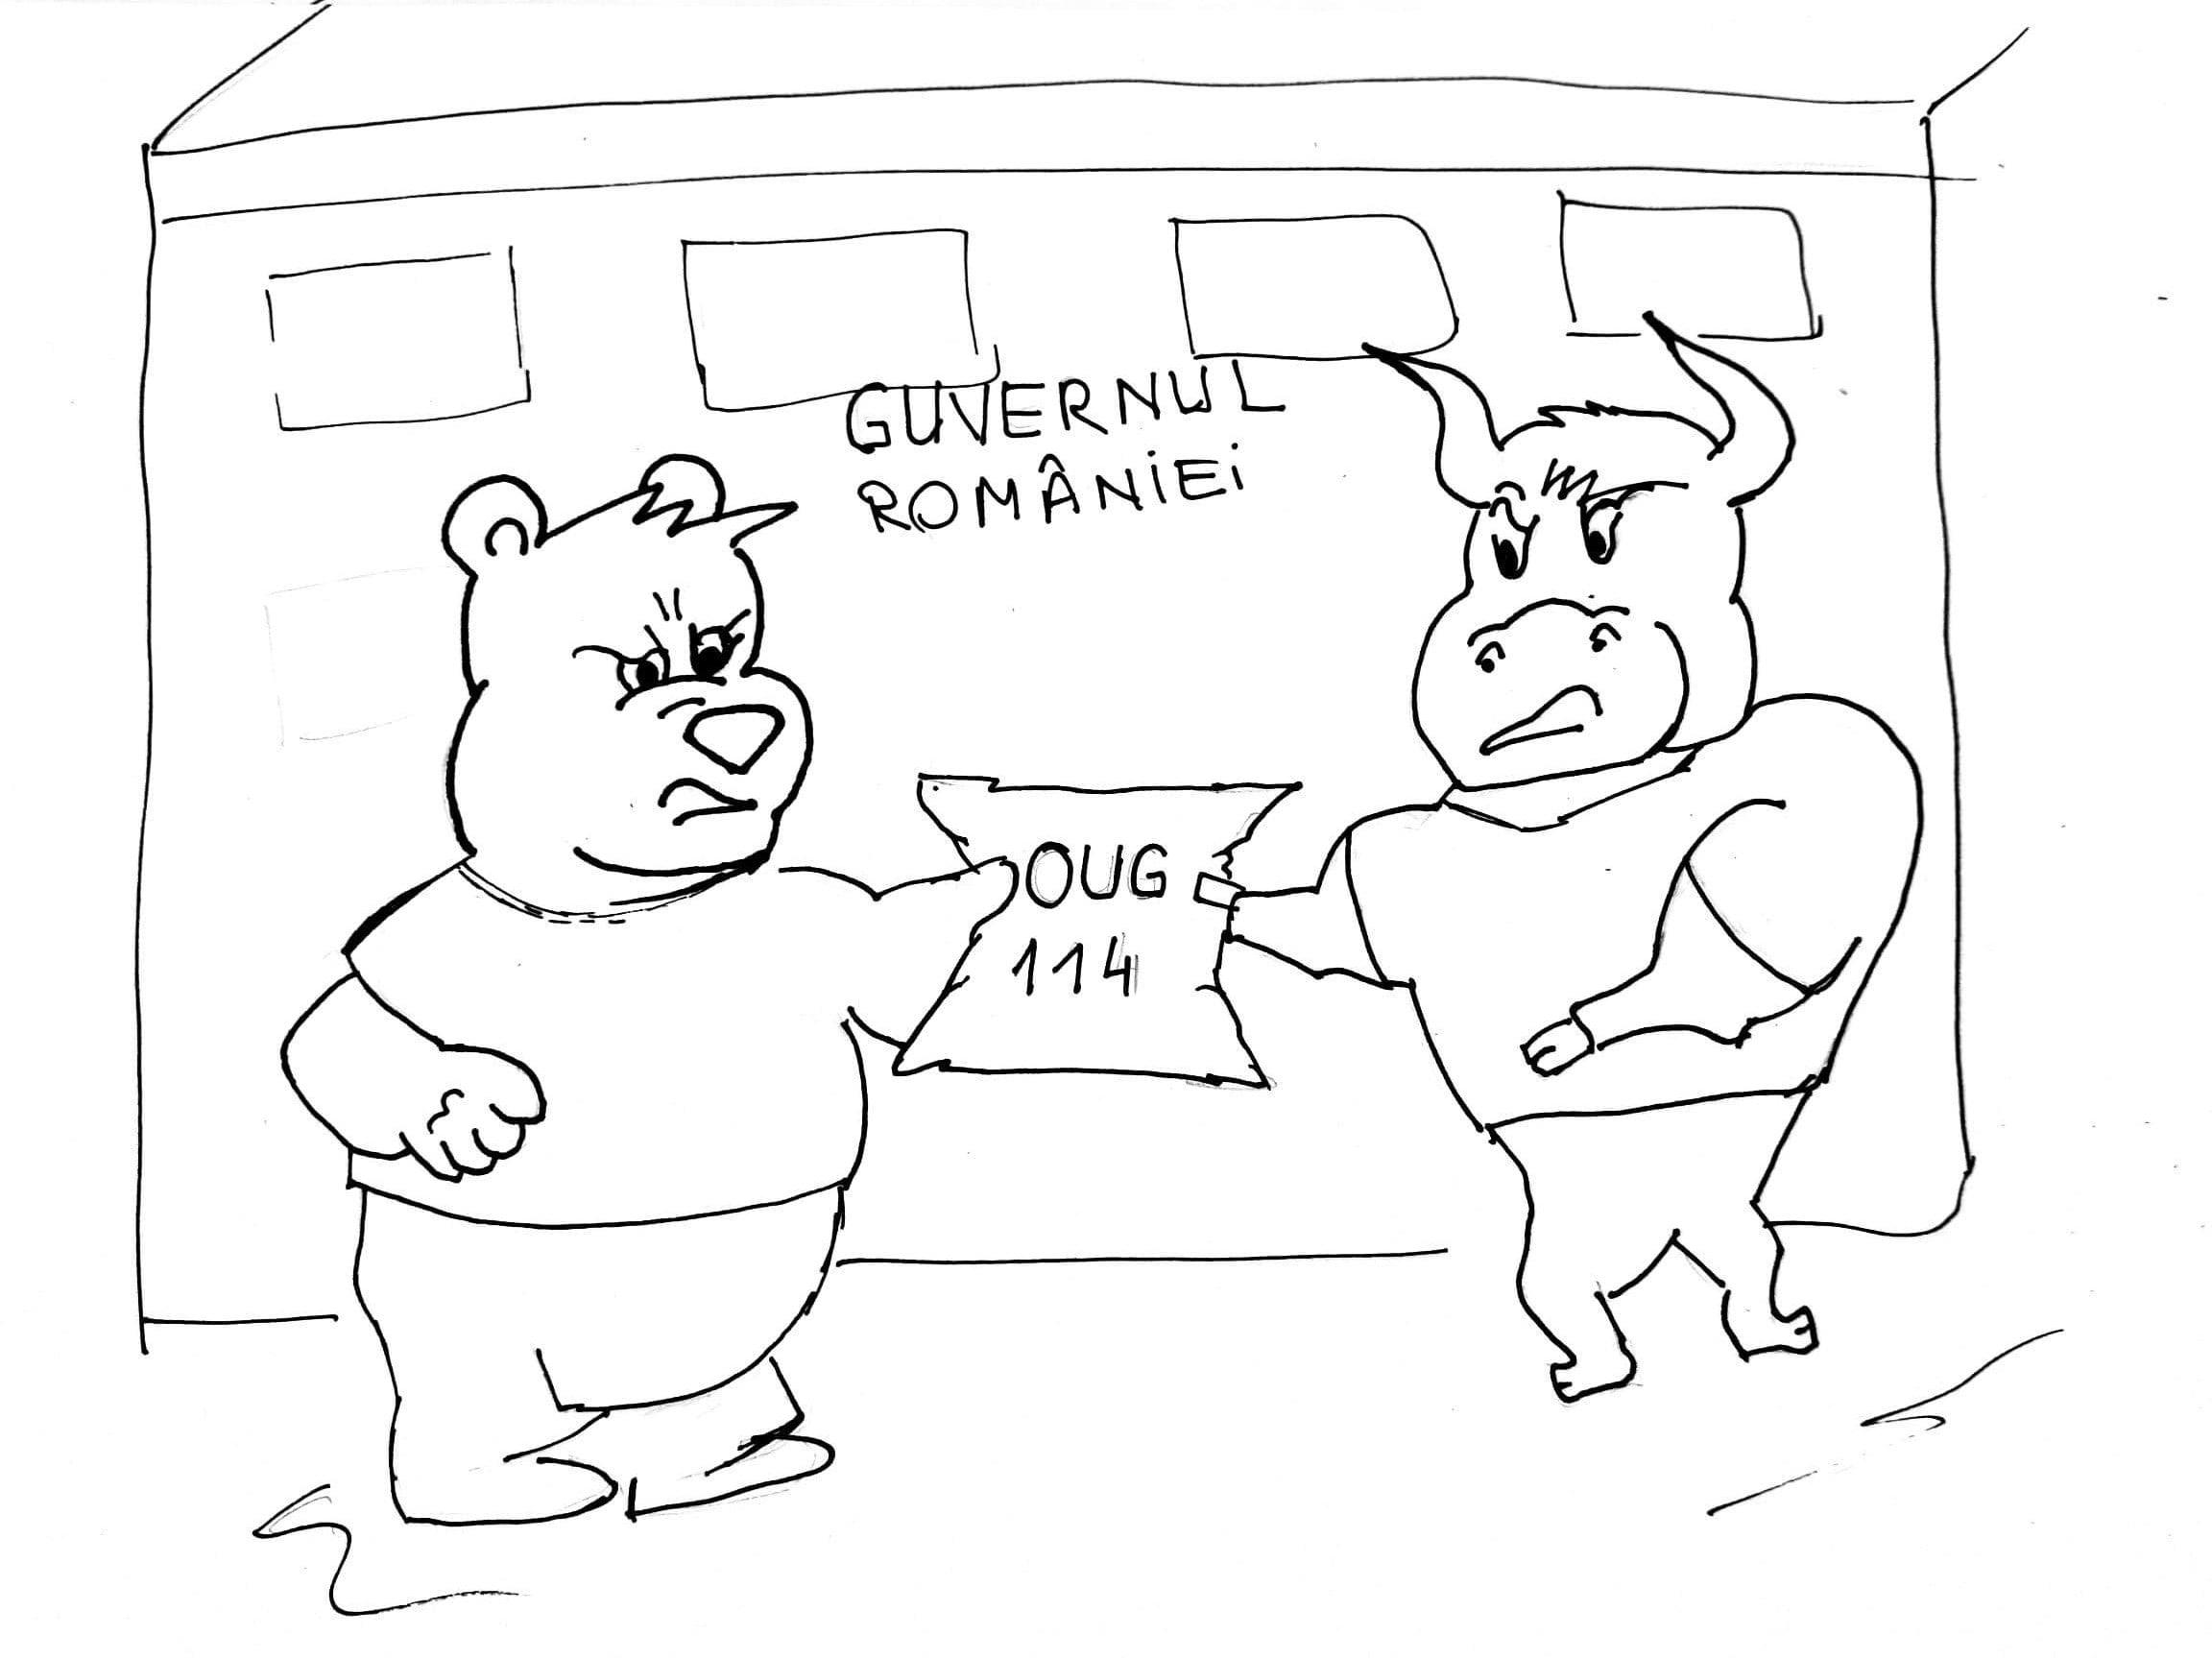 Bursa de Valori Bucuresti si OUG 114